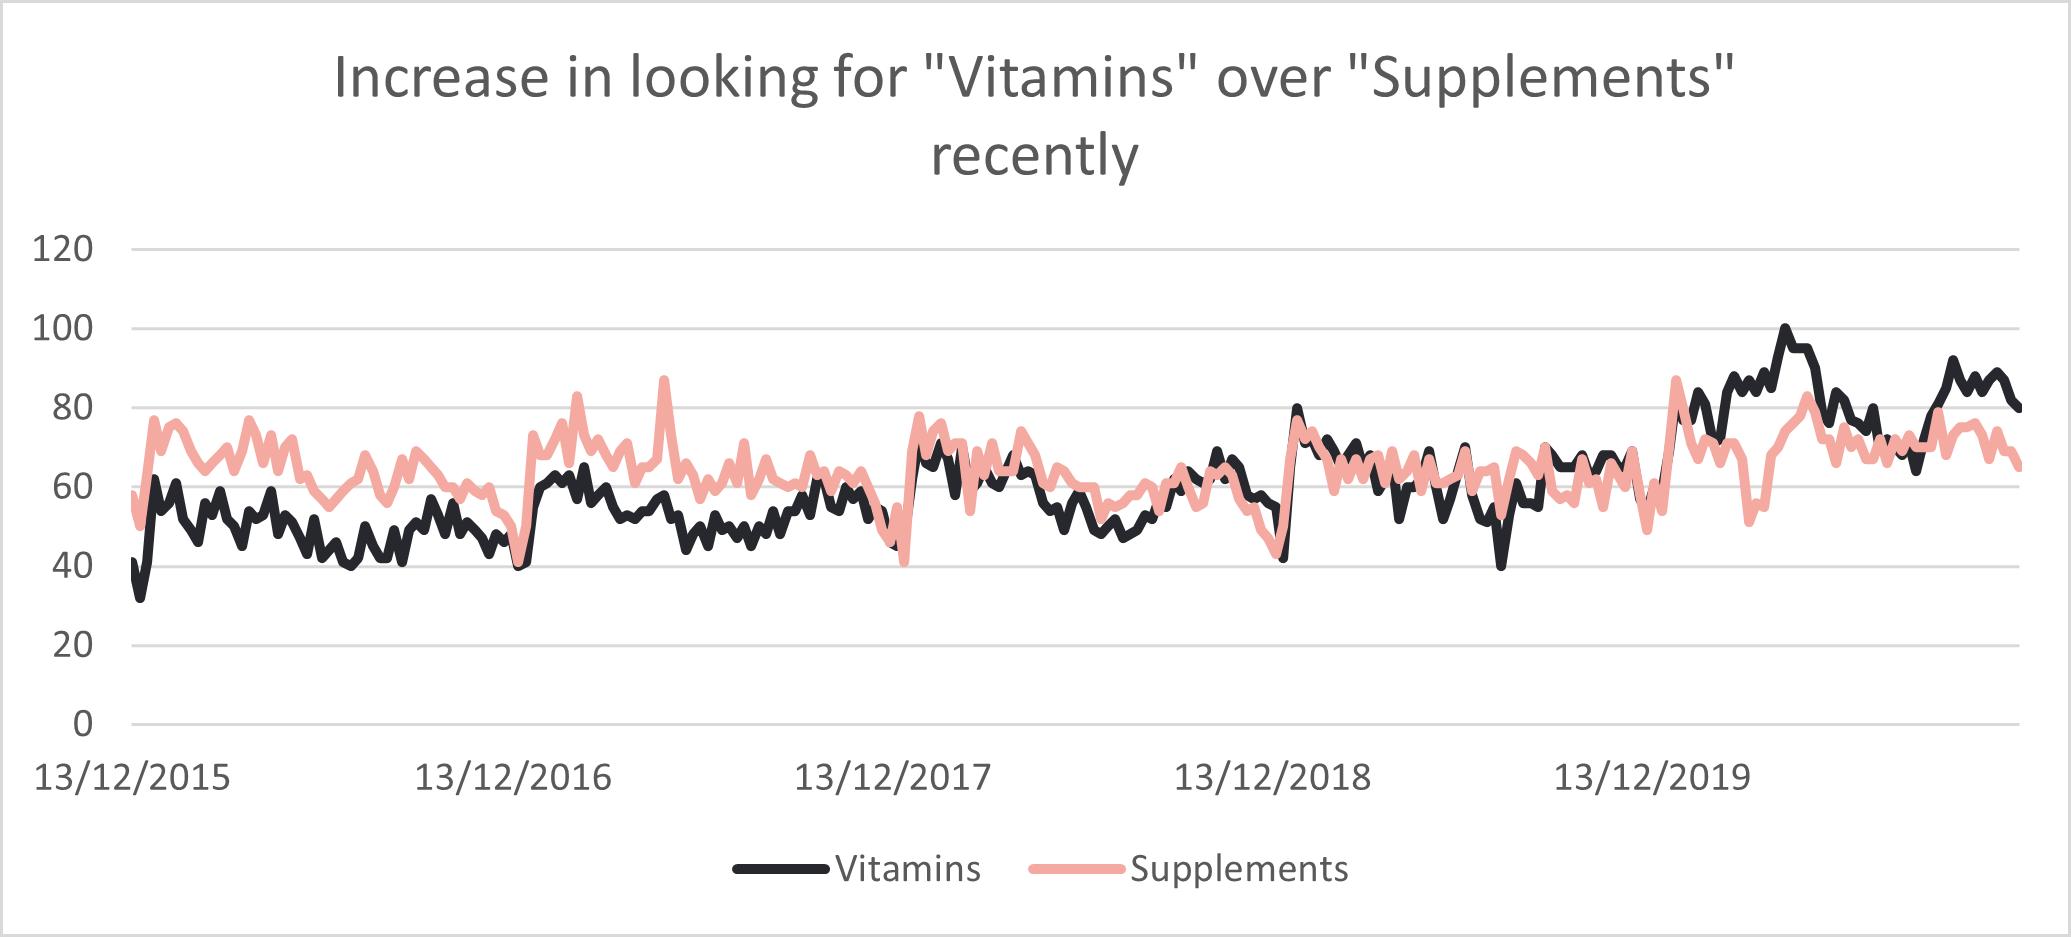 Vitamins overtaking supplements